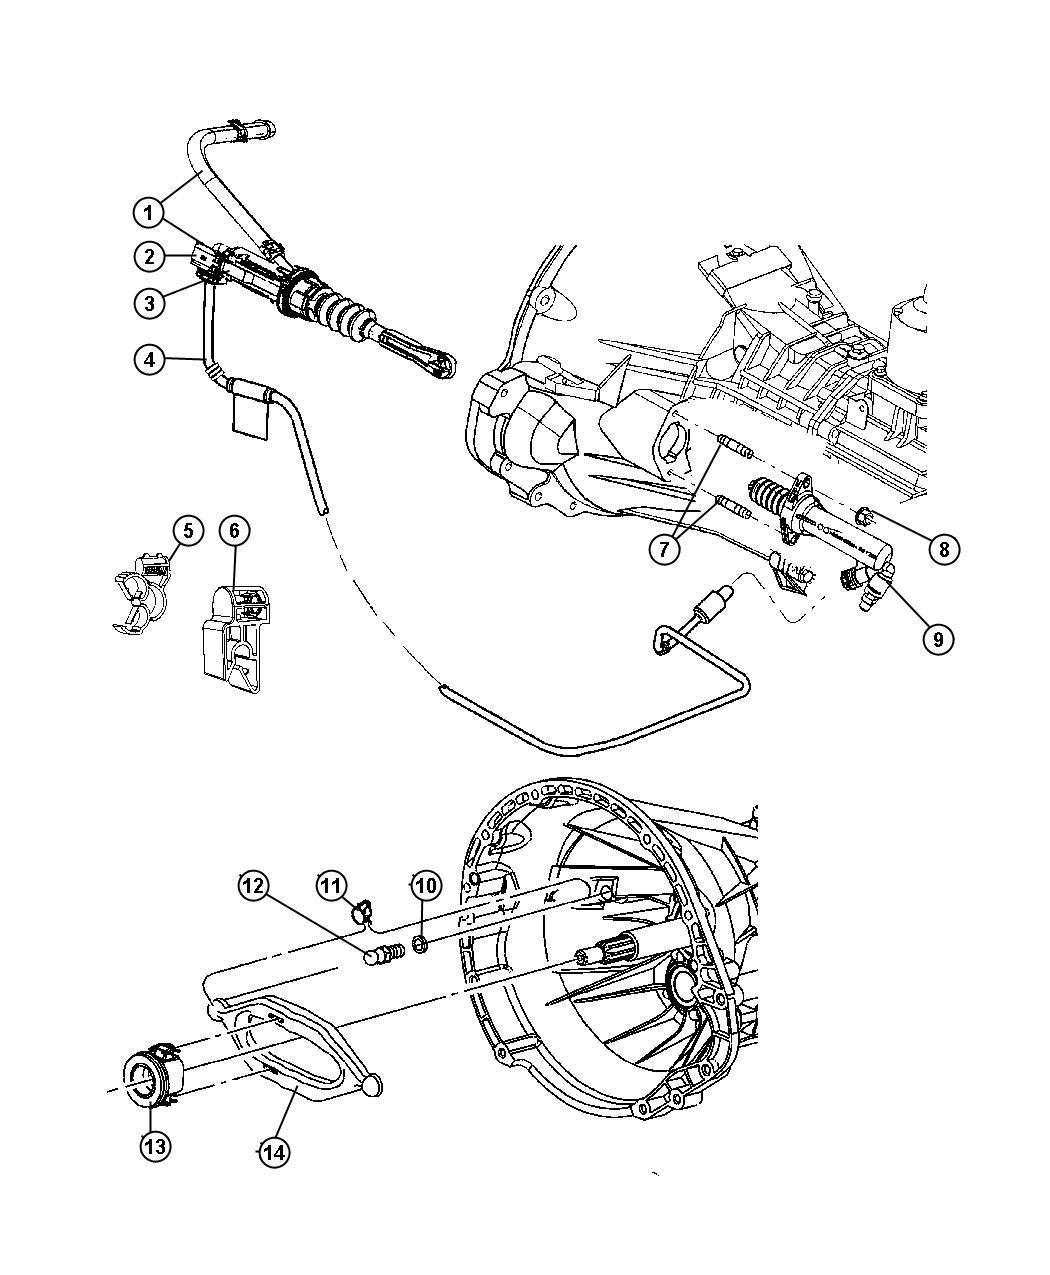 Jeep Wrangler X 4x4 3 8l V6 Smpi 6 Speed Manual Nsg370 Controls Hydraulic Clutch